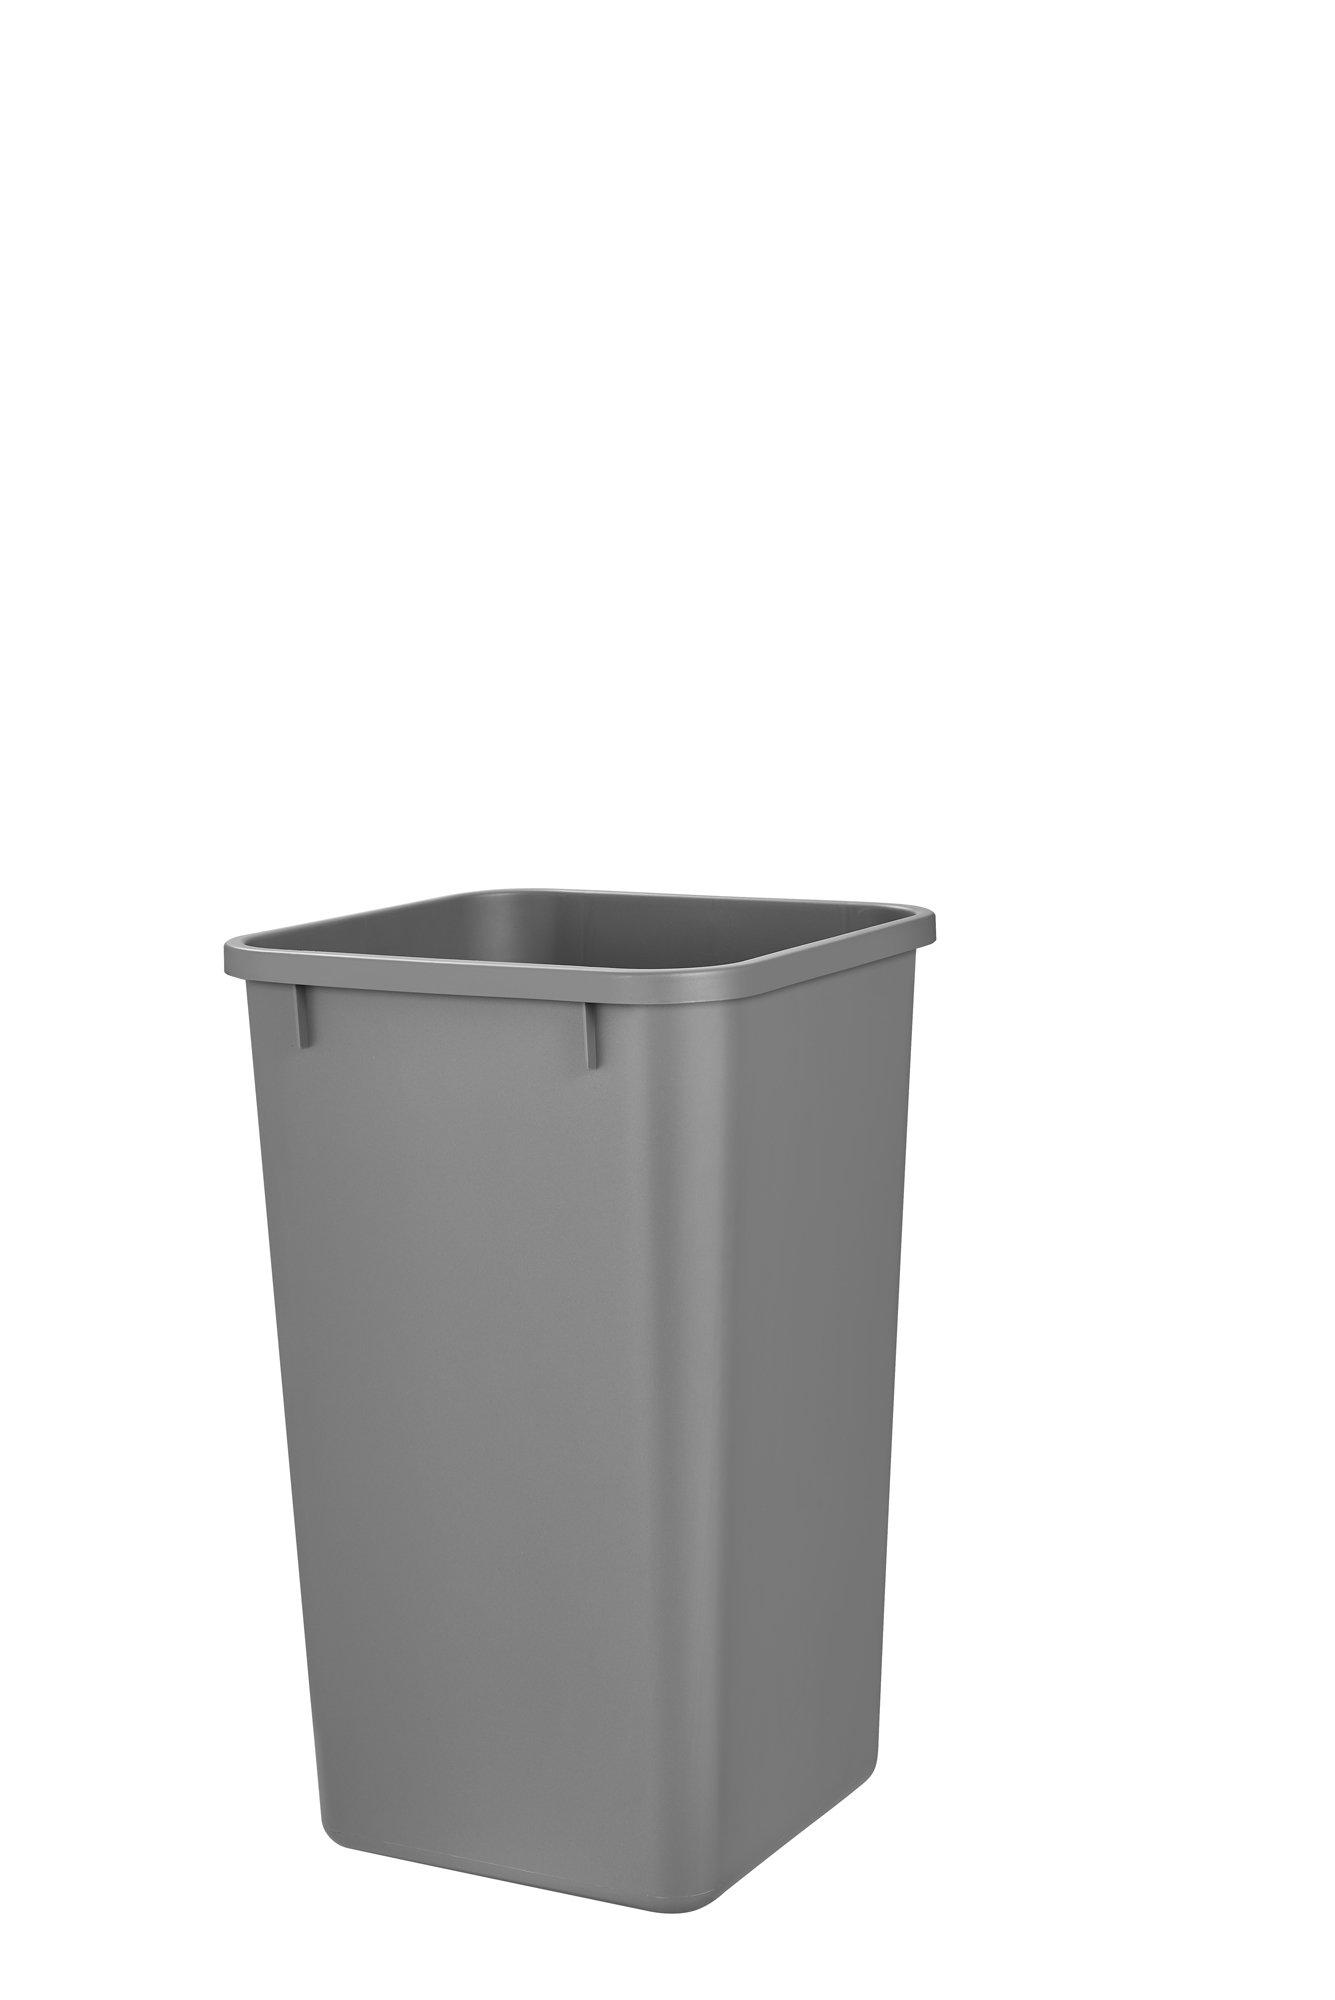 Rev-A-Shelf Rv-1024-17 27 Quart Replacement Container, Metallic Silver